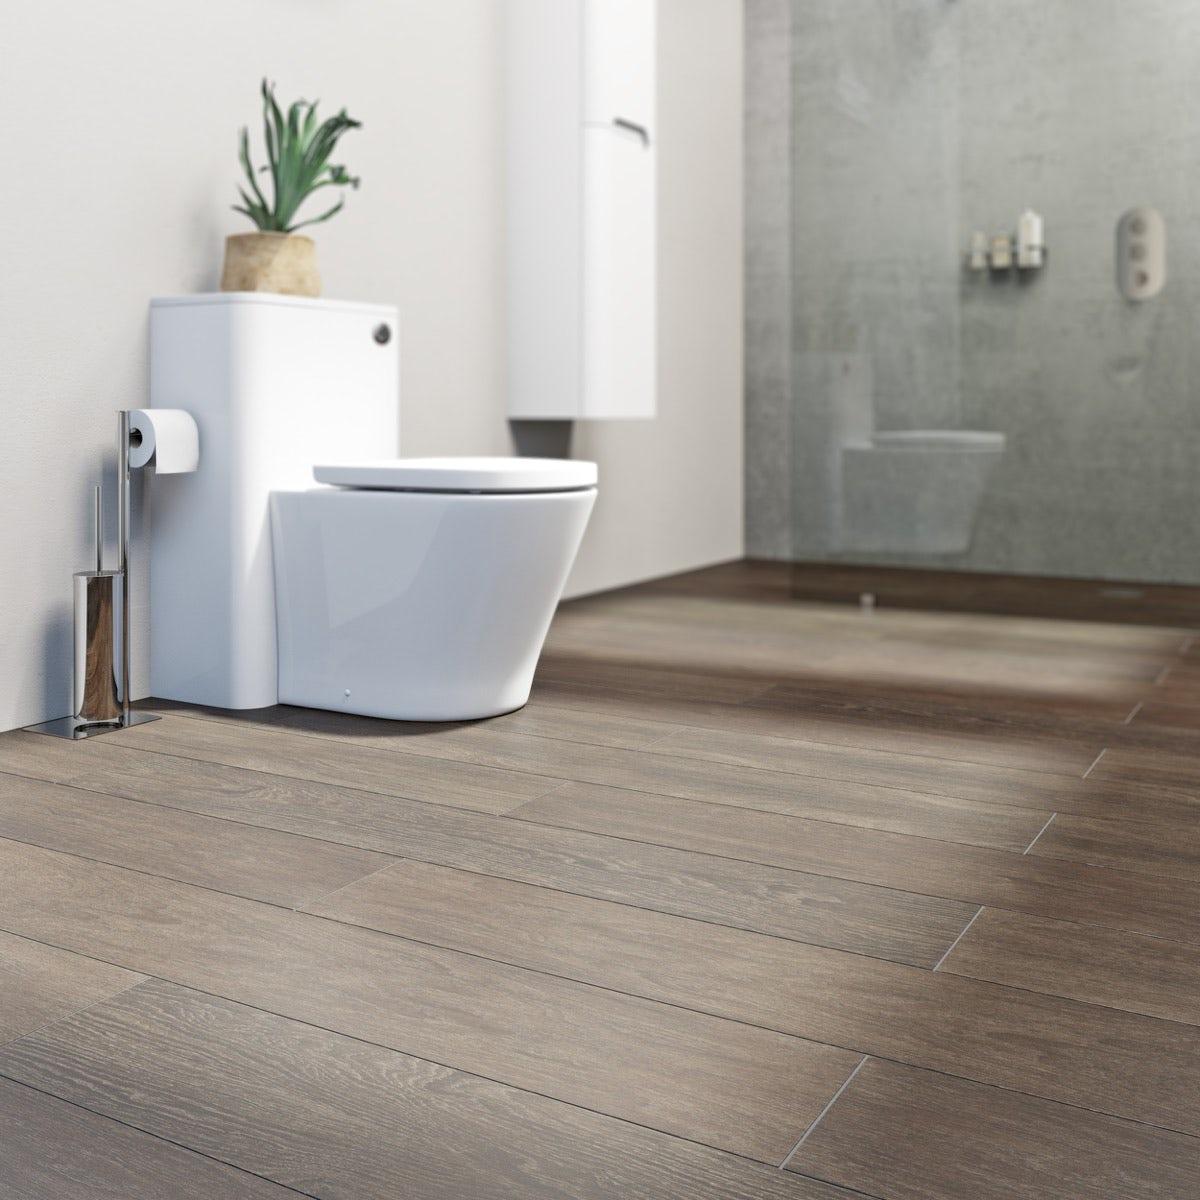 How To Lay Vinyl Flooring In Bathroom: Krono Xonic Columbus Waterproof Vinyl Flooring